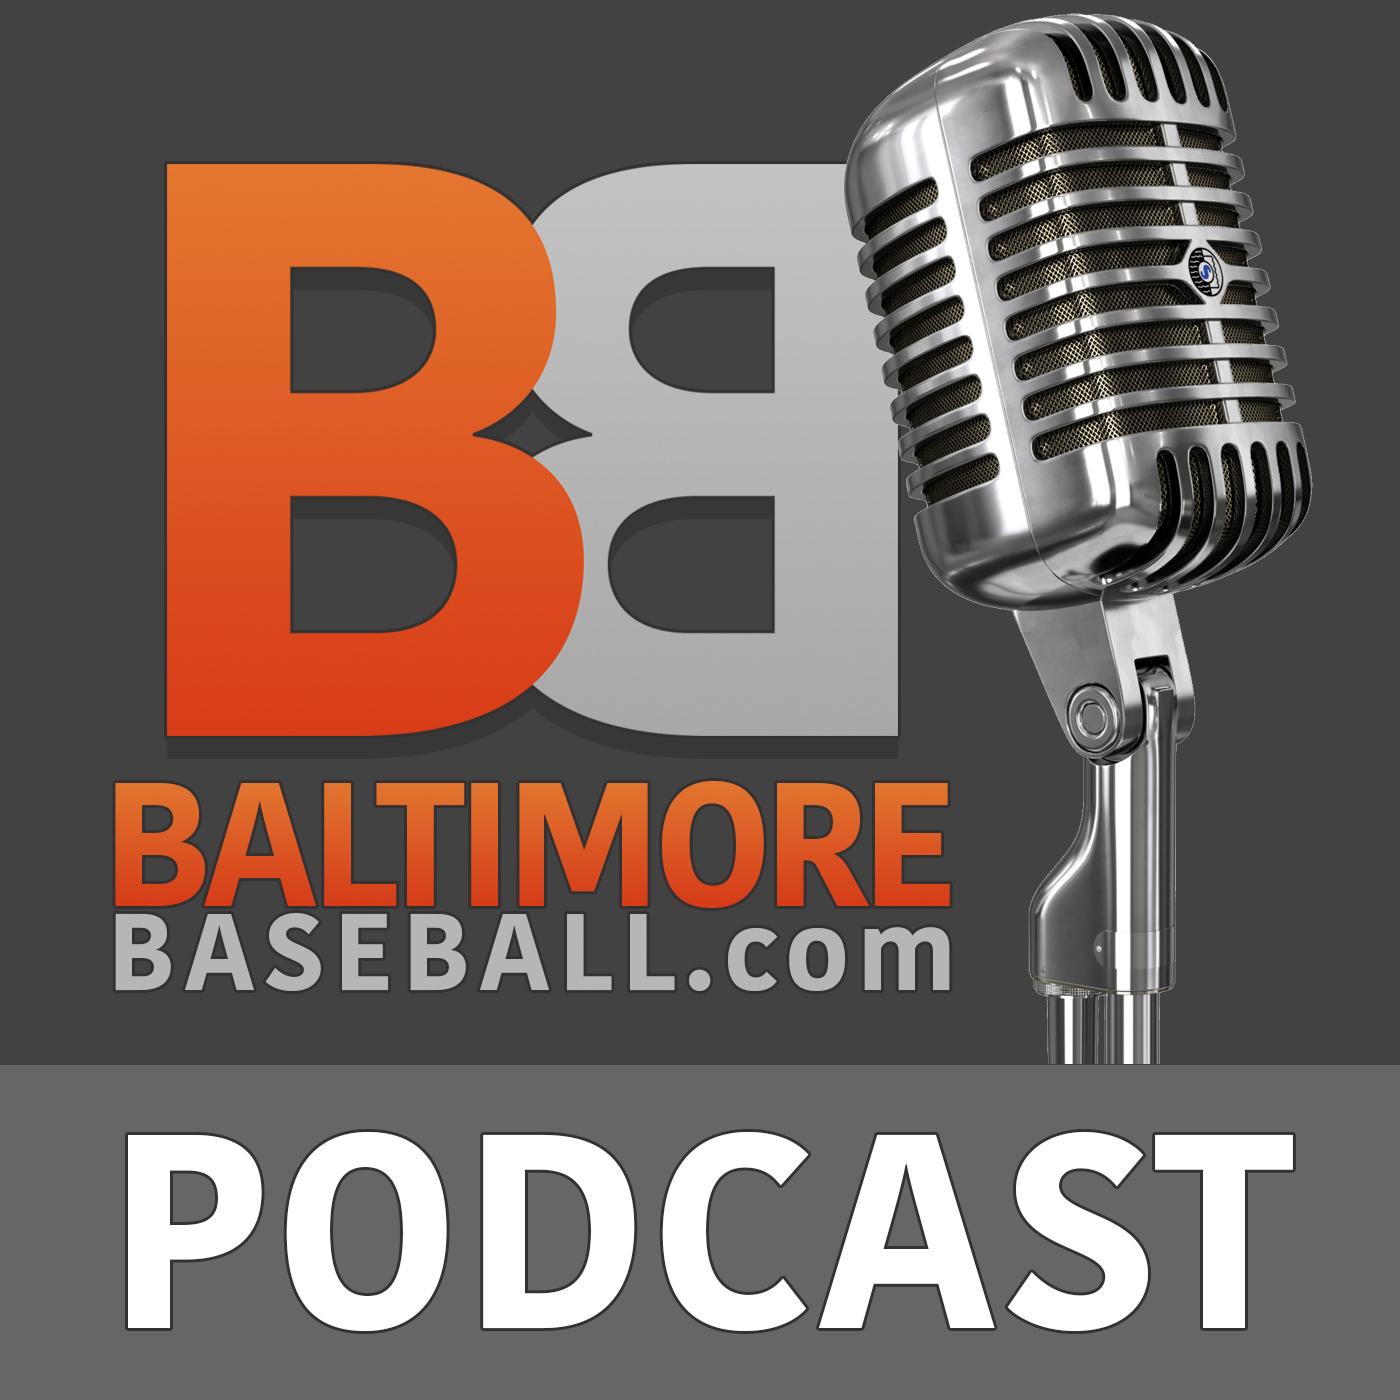 Baltimore Orioles Baseball Podcasts from BaltimoreBaseball.com show art